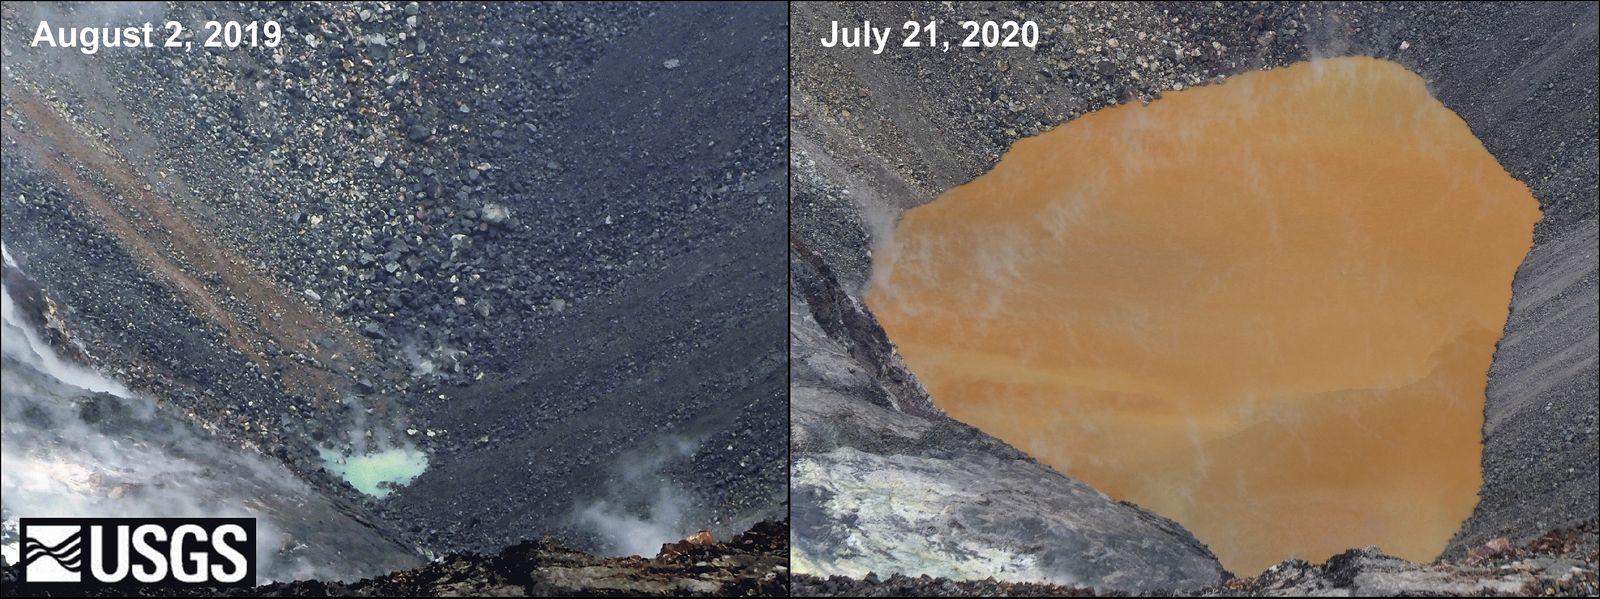 Kilauea - Halema'uma'u lake on 02.08.2019 and 21.07.2020 - Doc. USGS